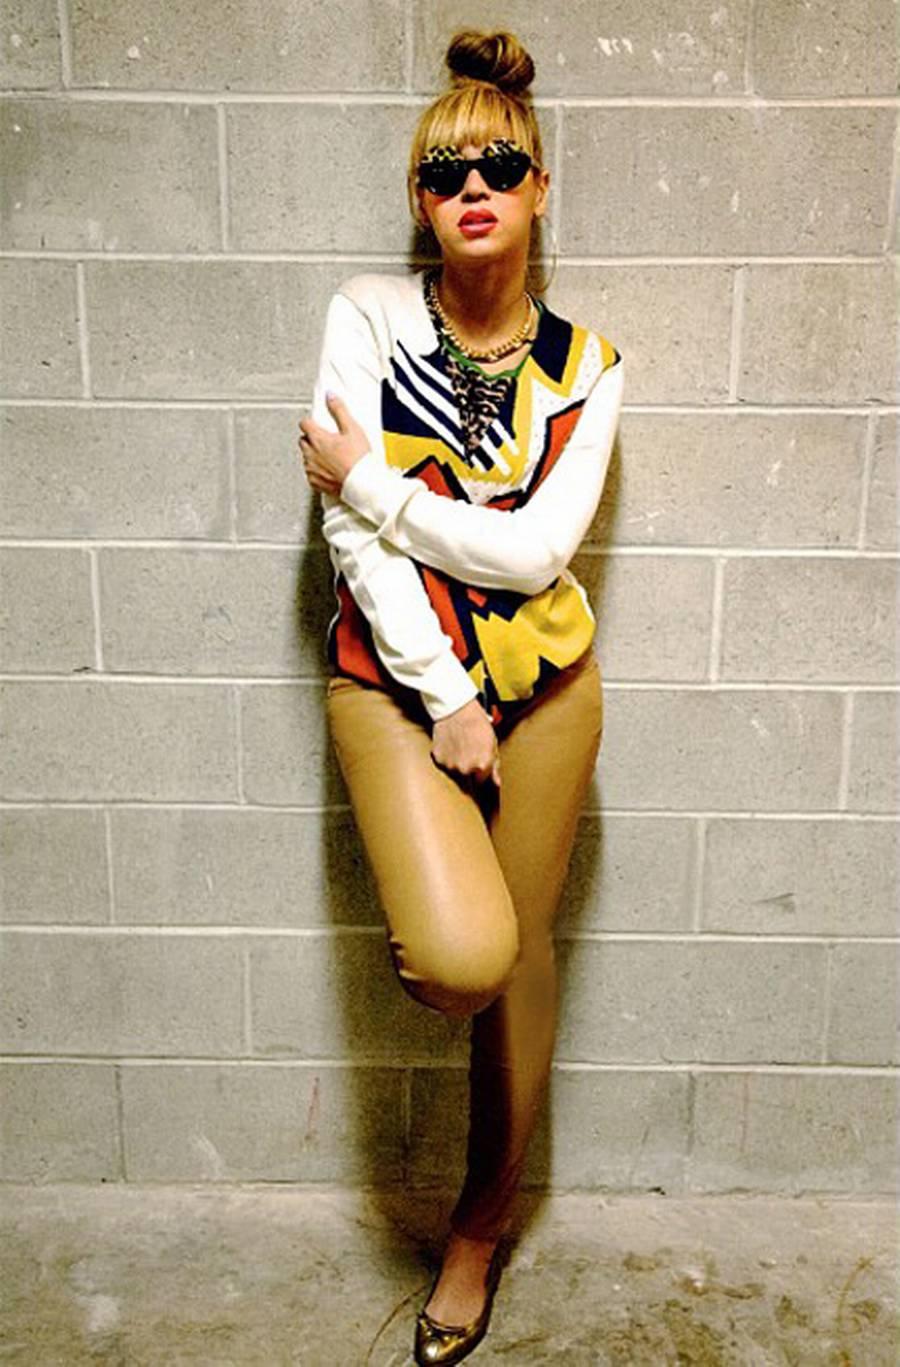 Beyoncés outfit: Høj knold tilsat 3.1 Phillip Lim sweatshirt og Marc by Marc Jacobs ballerinaer.